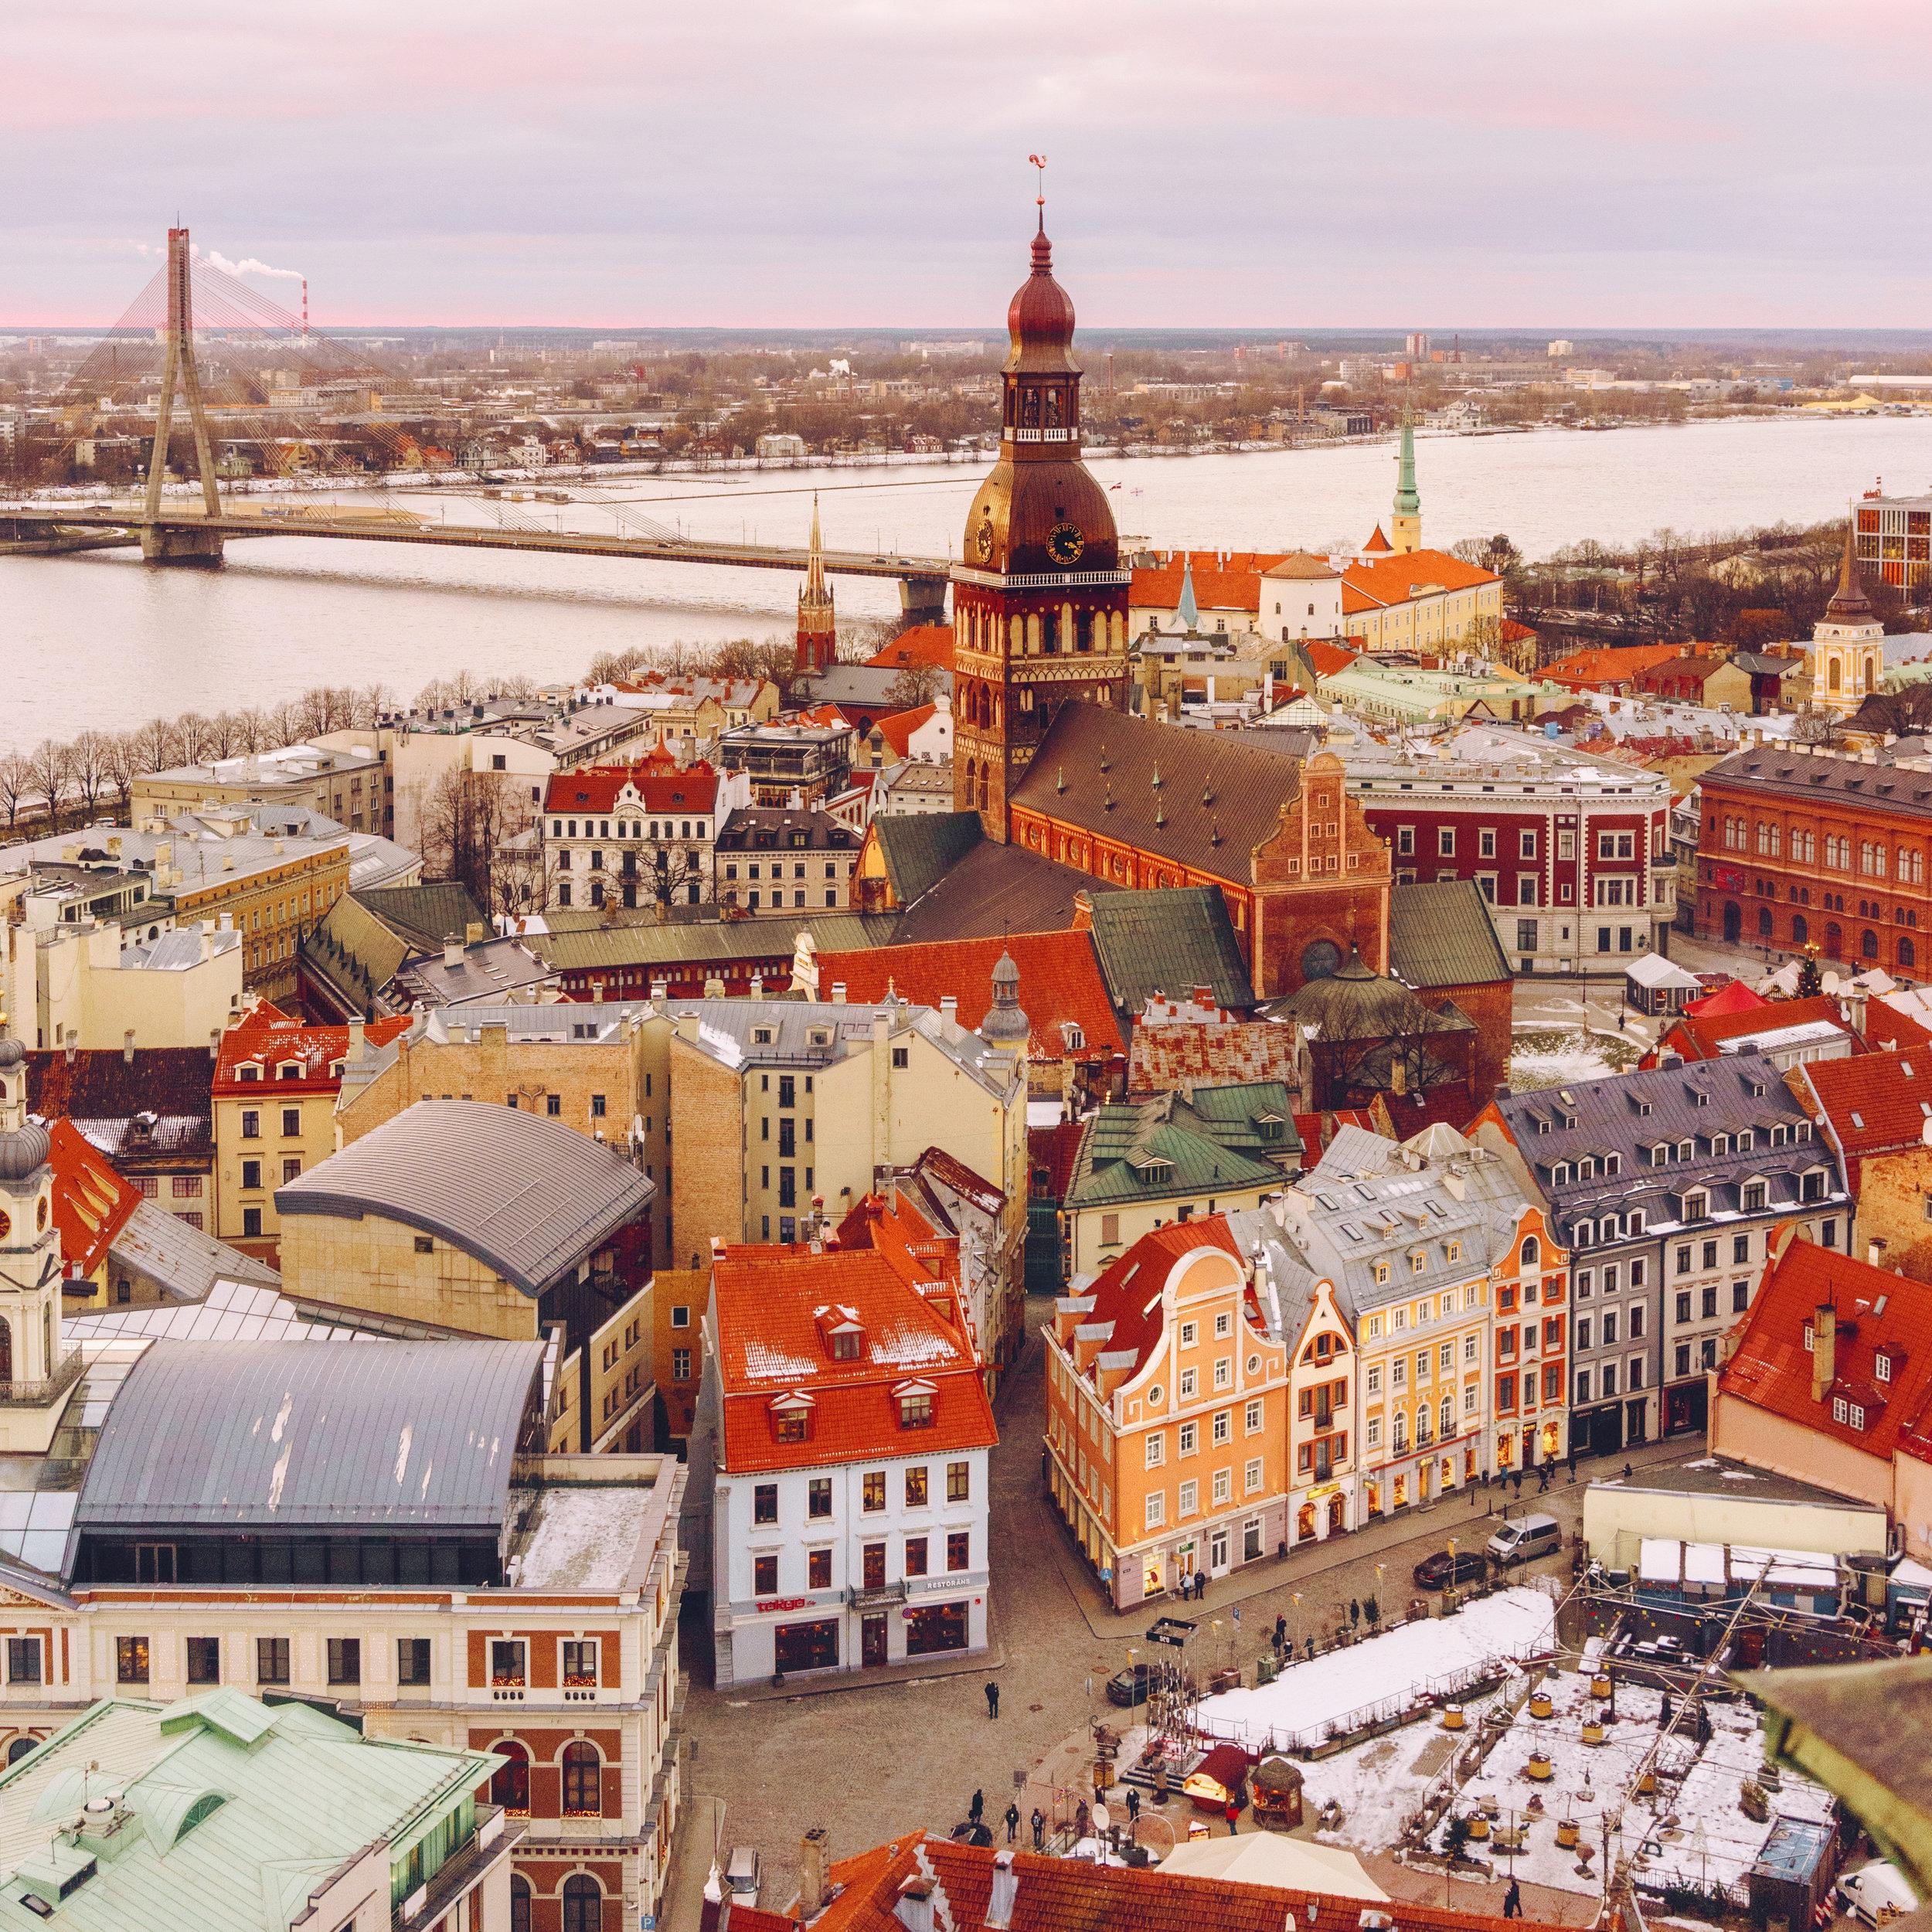 Holiday Magic in Riga, Latvia - Dec 2017